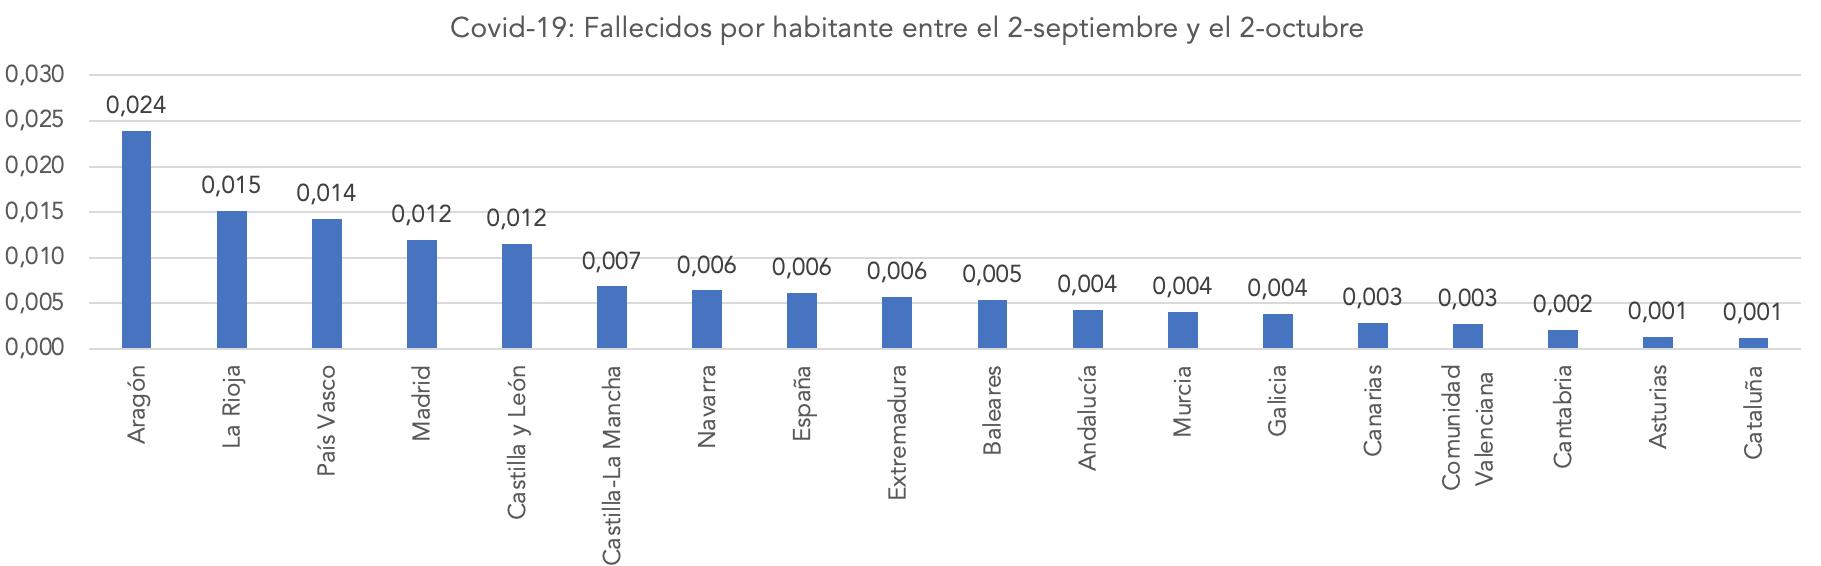 2-covid-19-muertes-por-habitante-segunda-ola-coronavirus-espana-septiembre-2020-por-ccaa.png